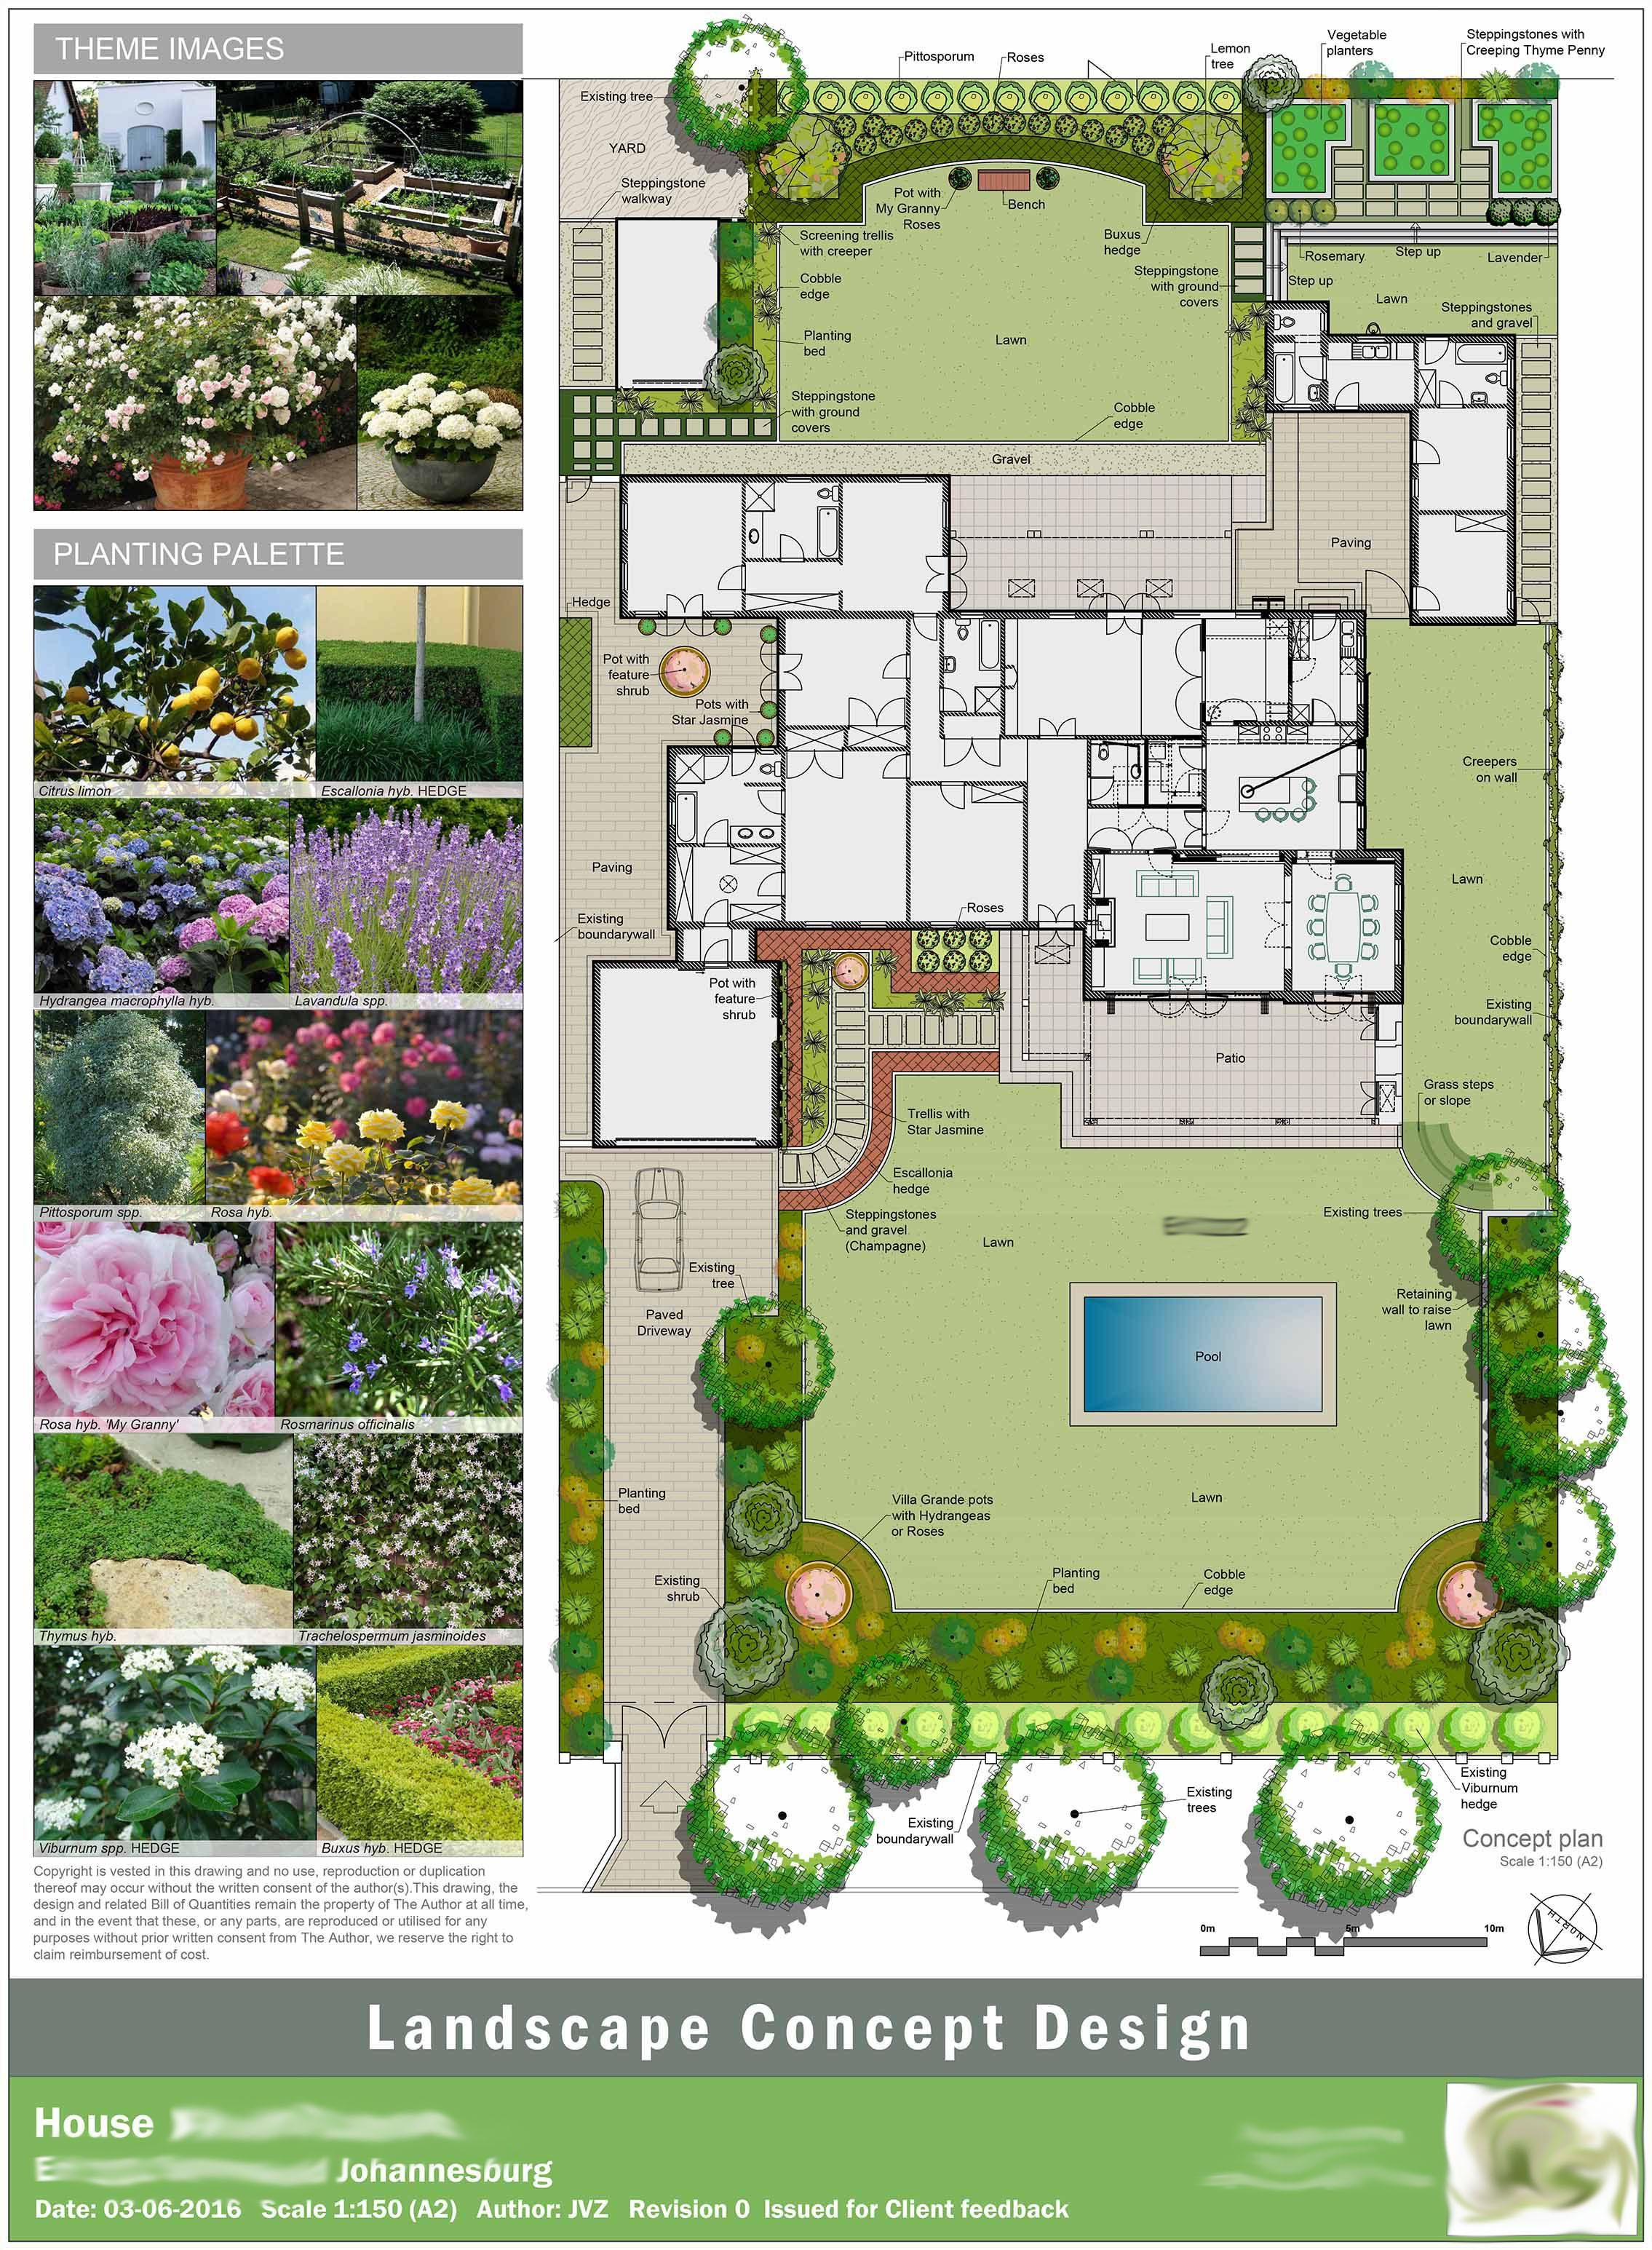 060d50e7-07d9-47f6-84b1-ef1513cfd9d0-original.jpeg (2270×3091) | Garden Design Layout Landscaping, Landscape Design Plans, Garden Design Plans